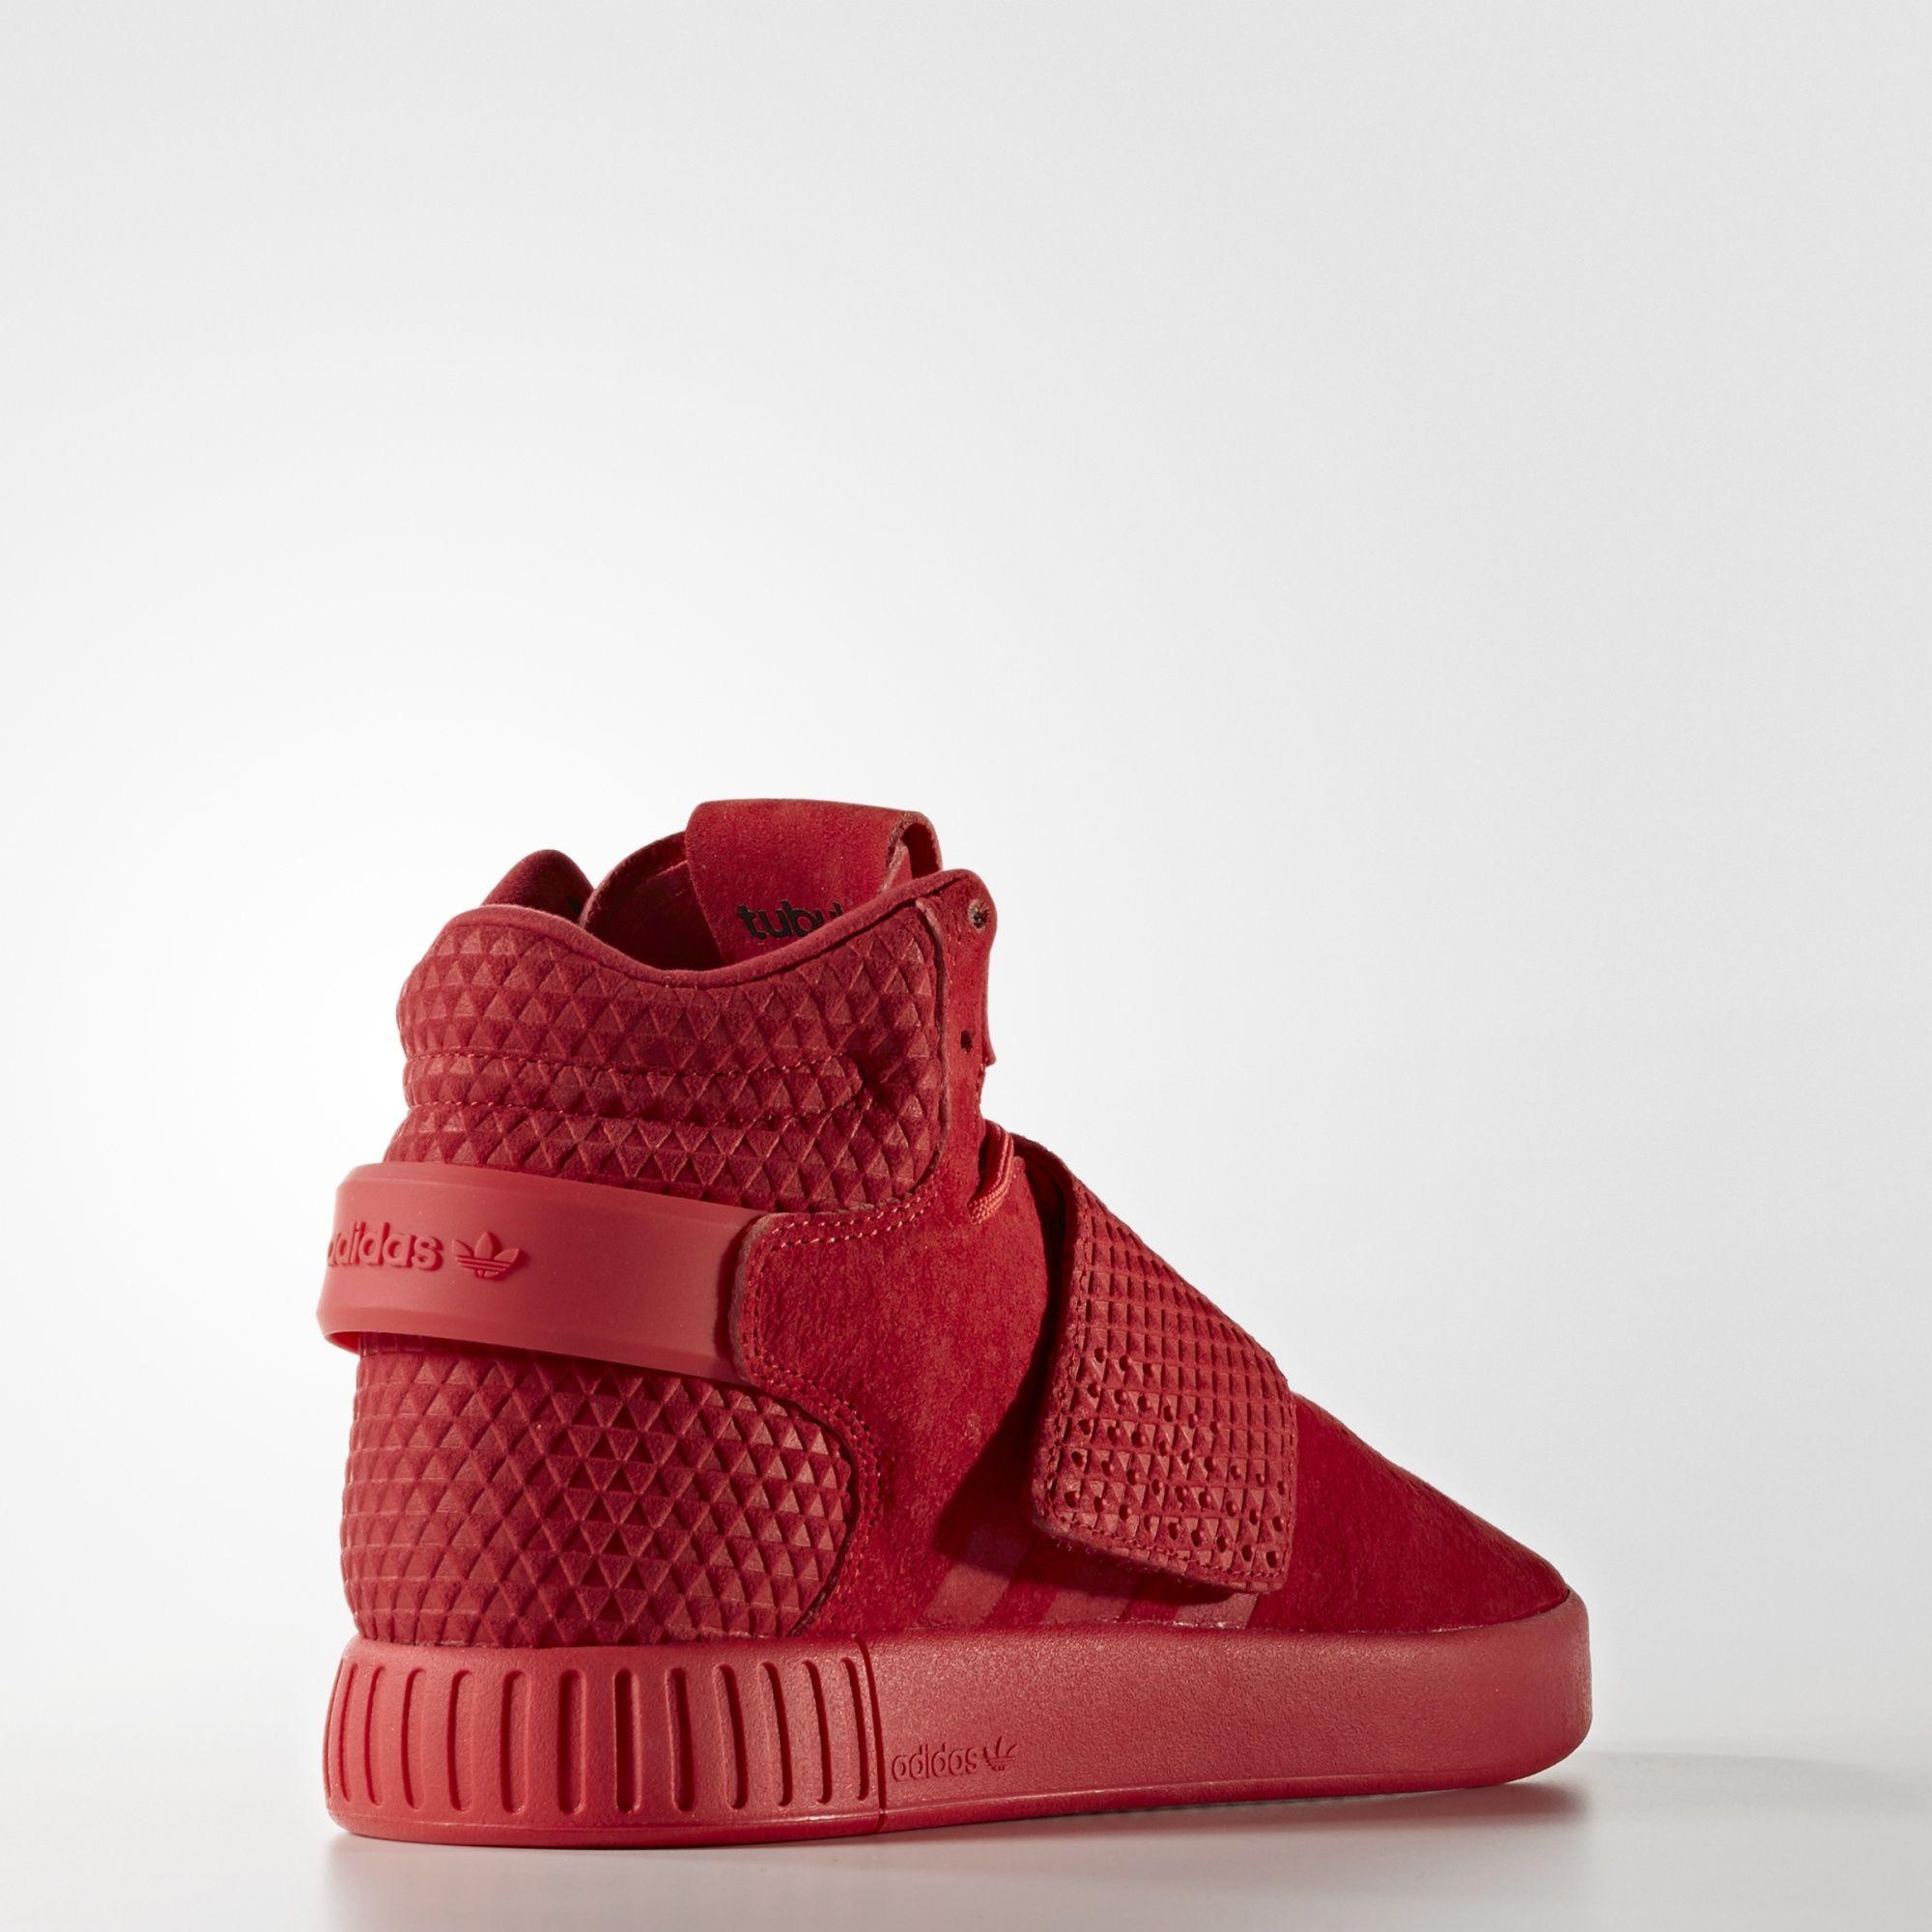 adidas tubular invader strap rouge